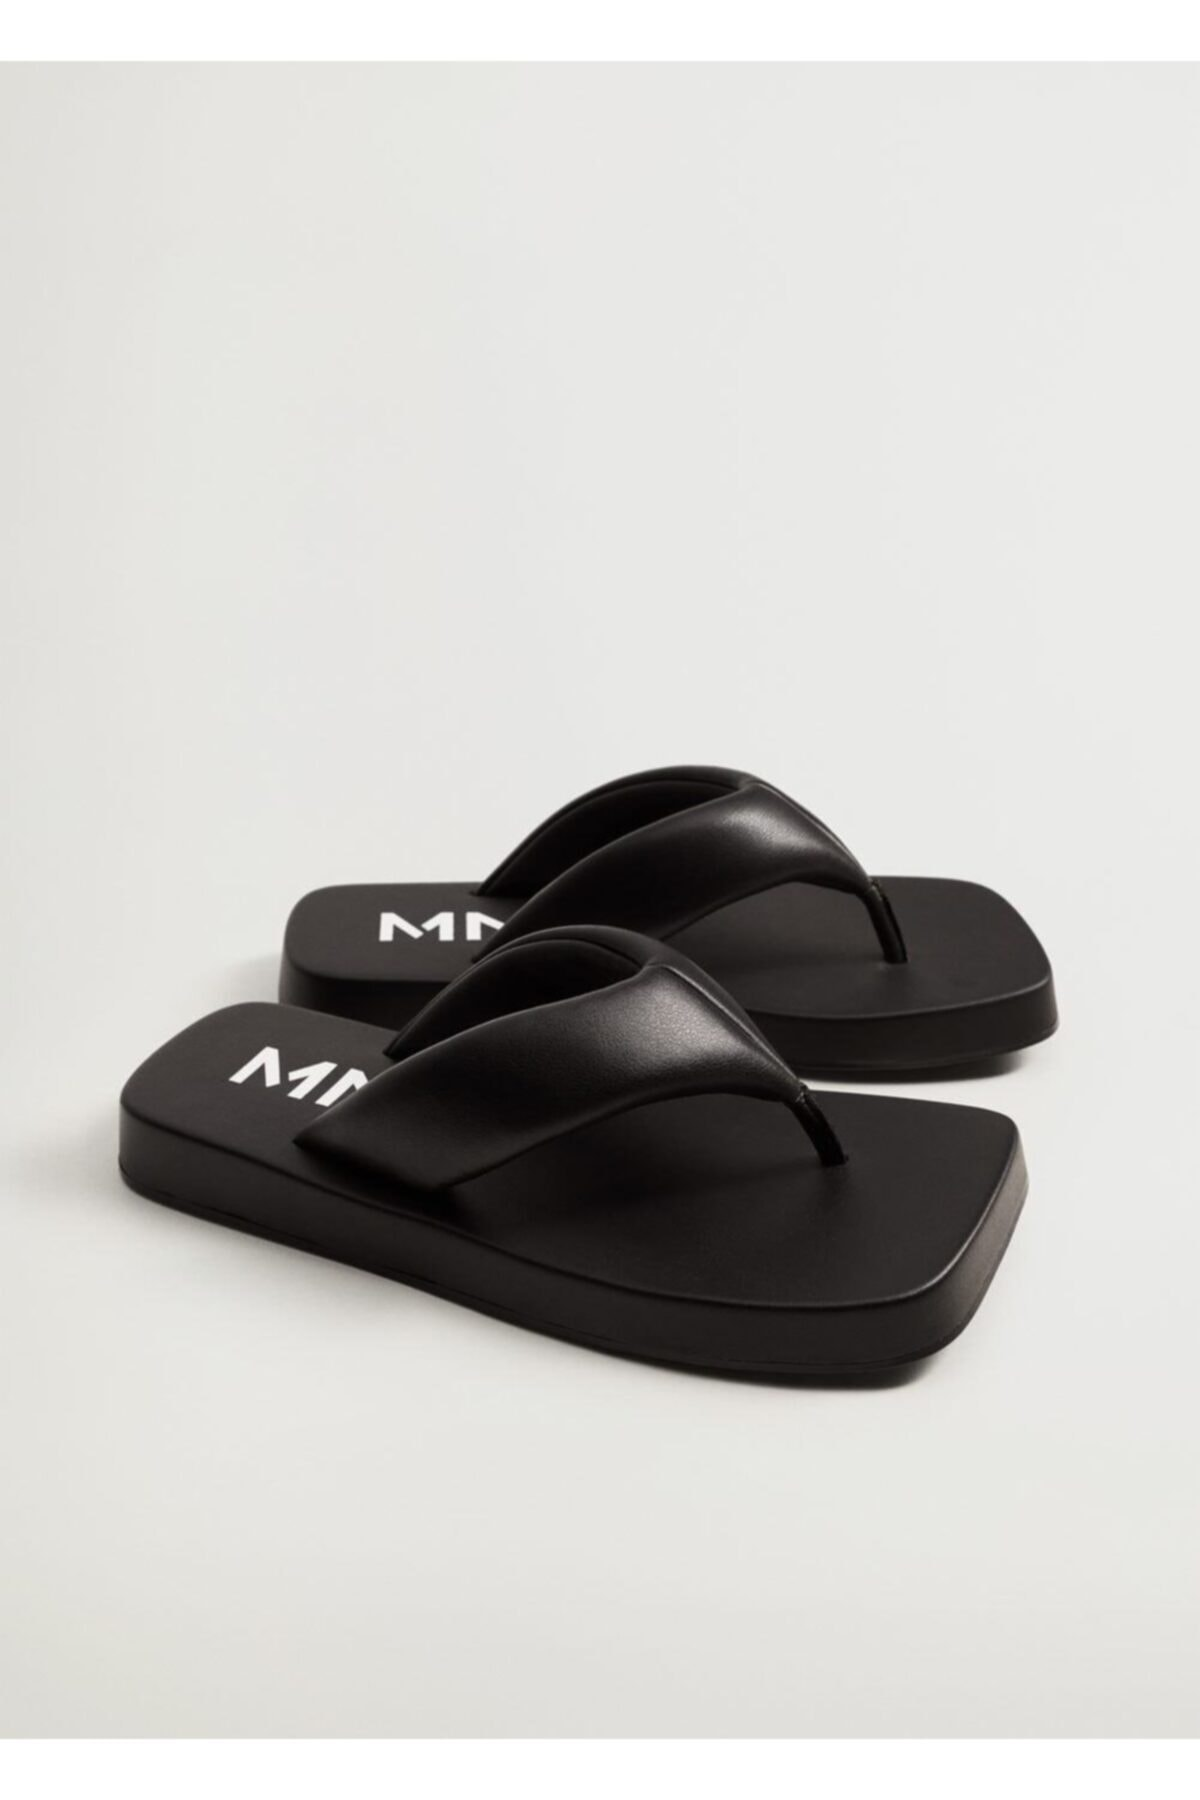 MANGO Woman Kadın Siyah Kapitone Platform Sandalet 1